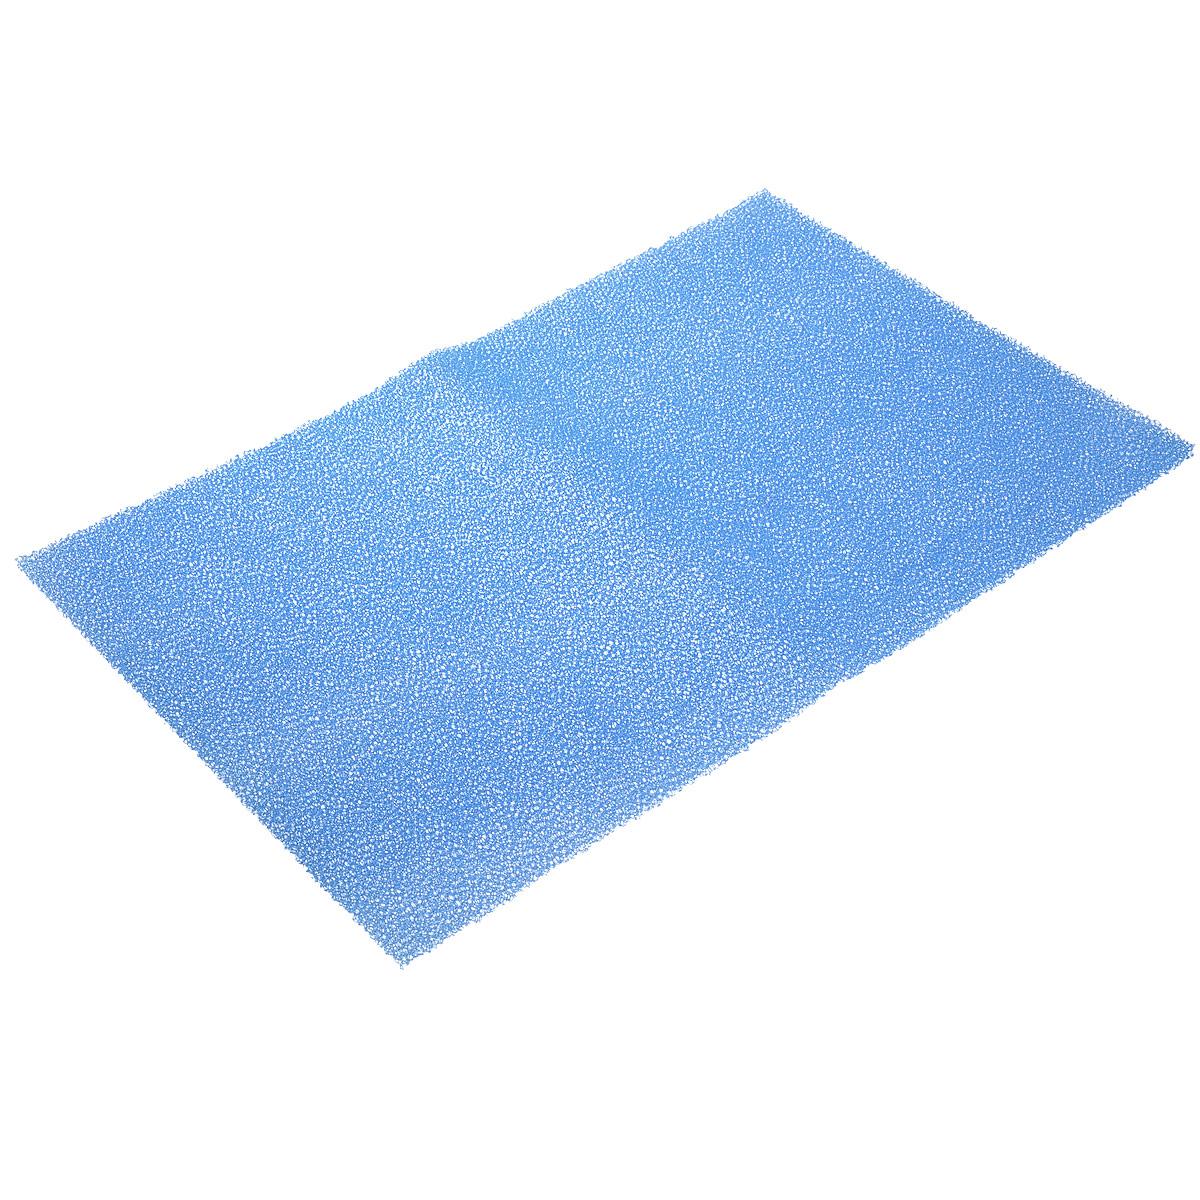 "Коврик для холодильника ""Magic Power"", антибактериальный, цвет: синий, 49 см х 32 см MP-612_синий"